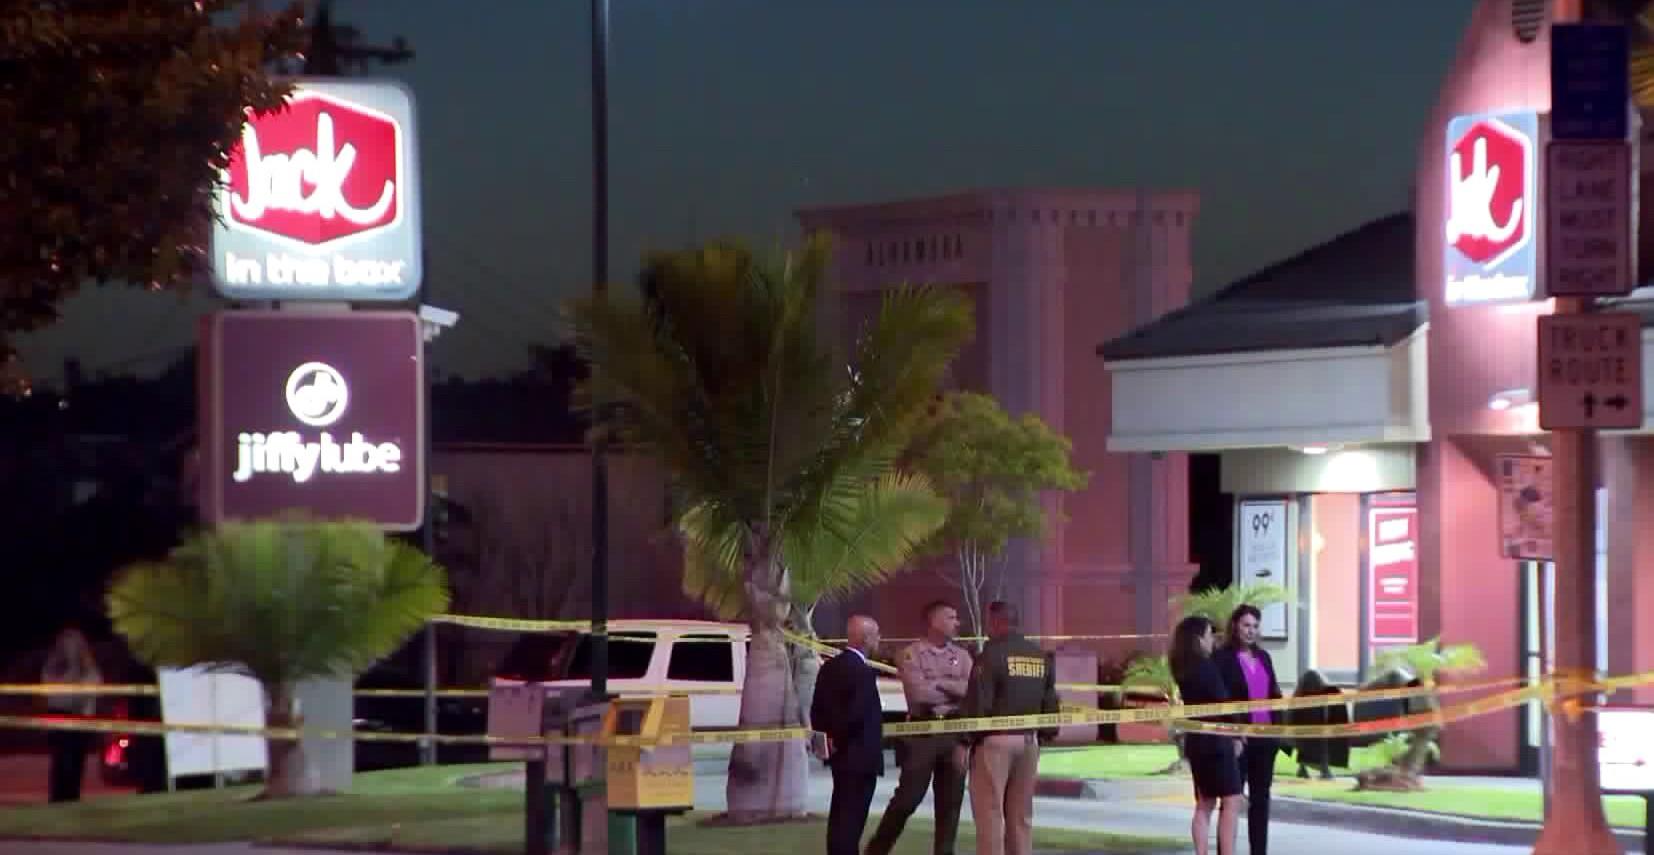 Photos: Utah man suspected of shooting 2 men in California, including off-dutydeputy